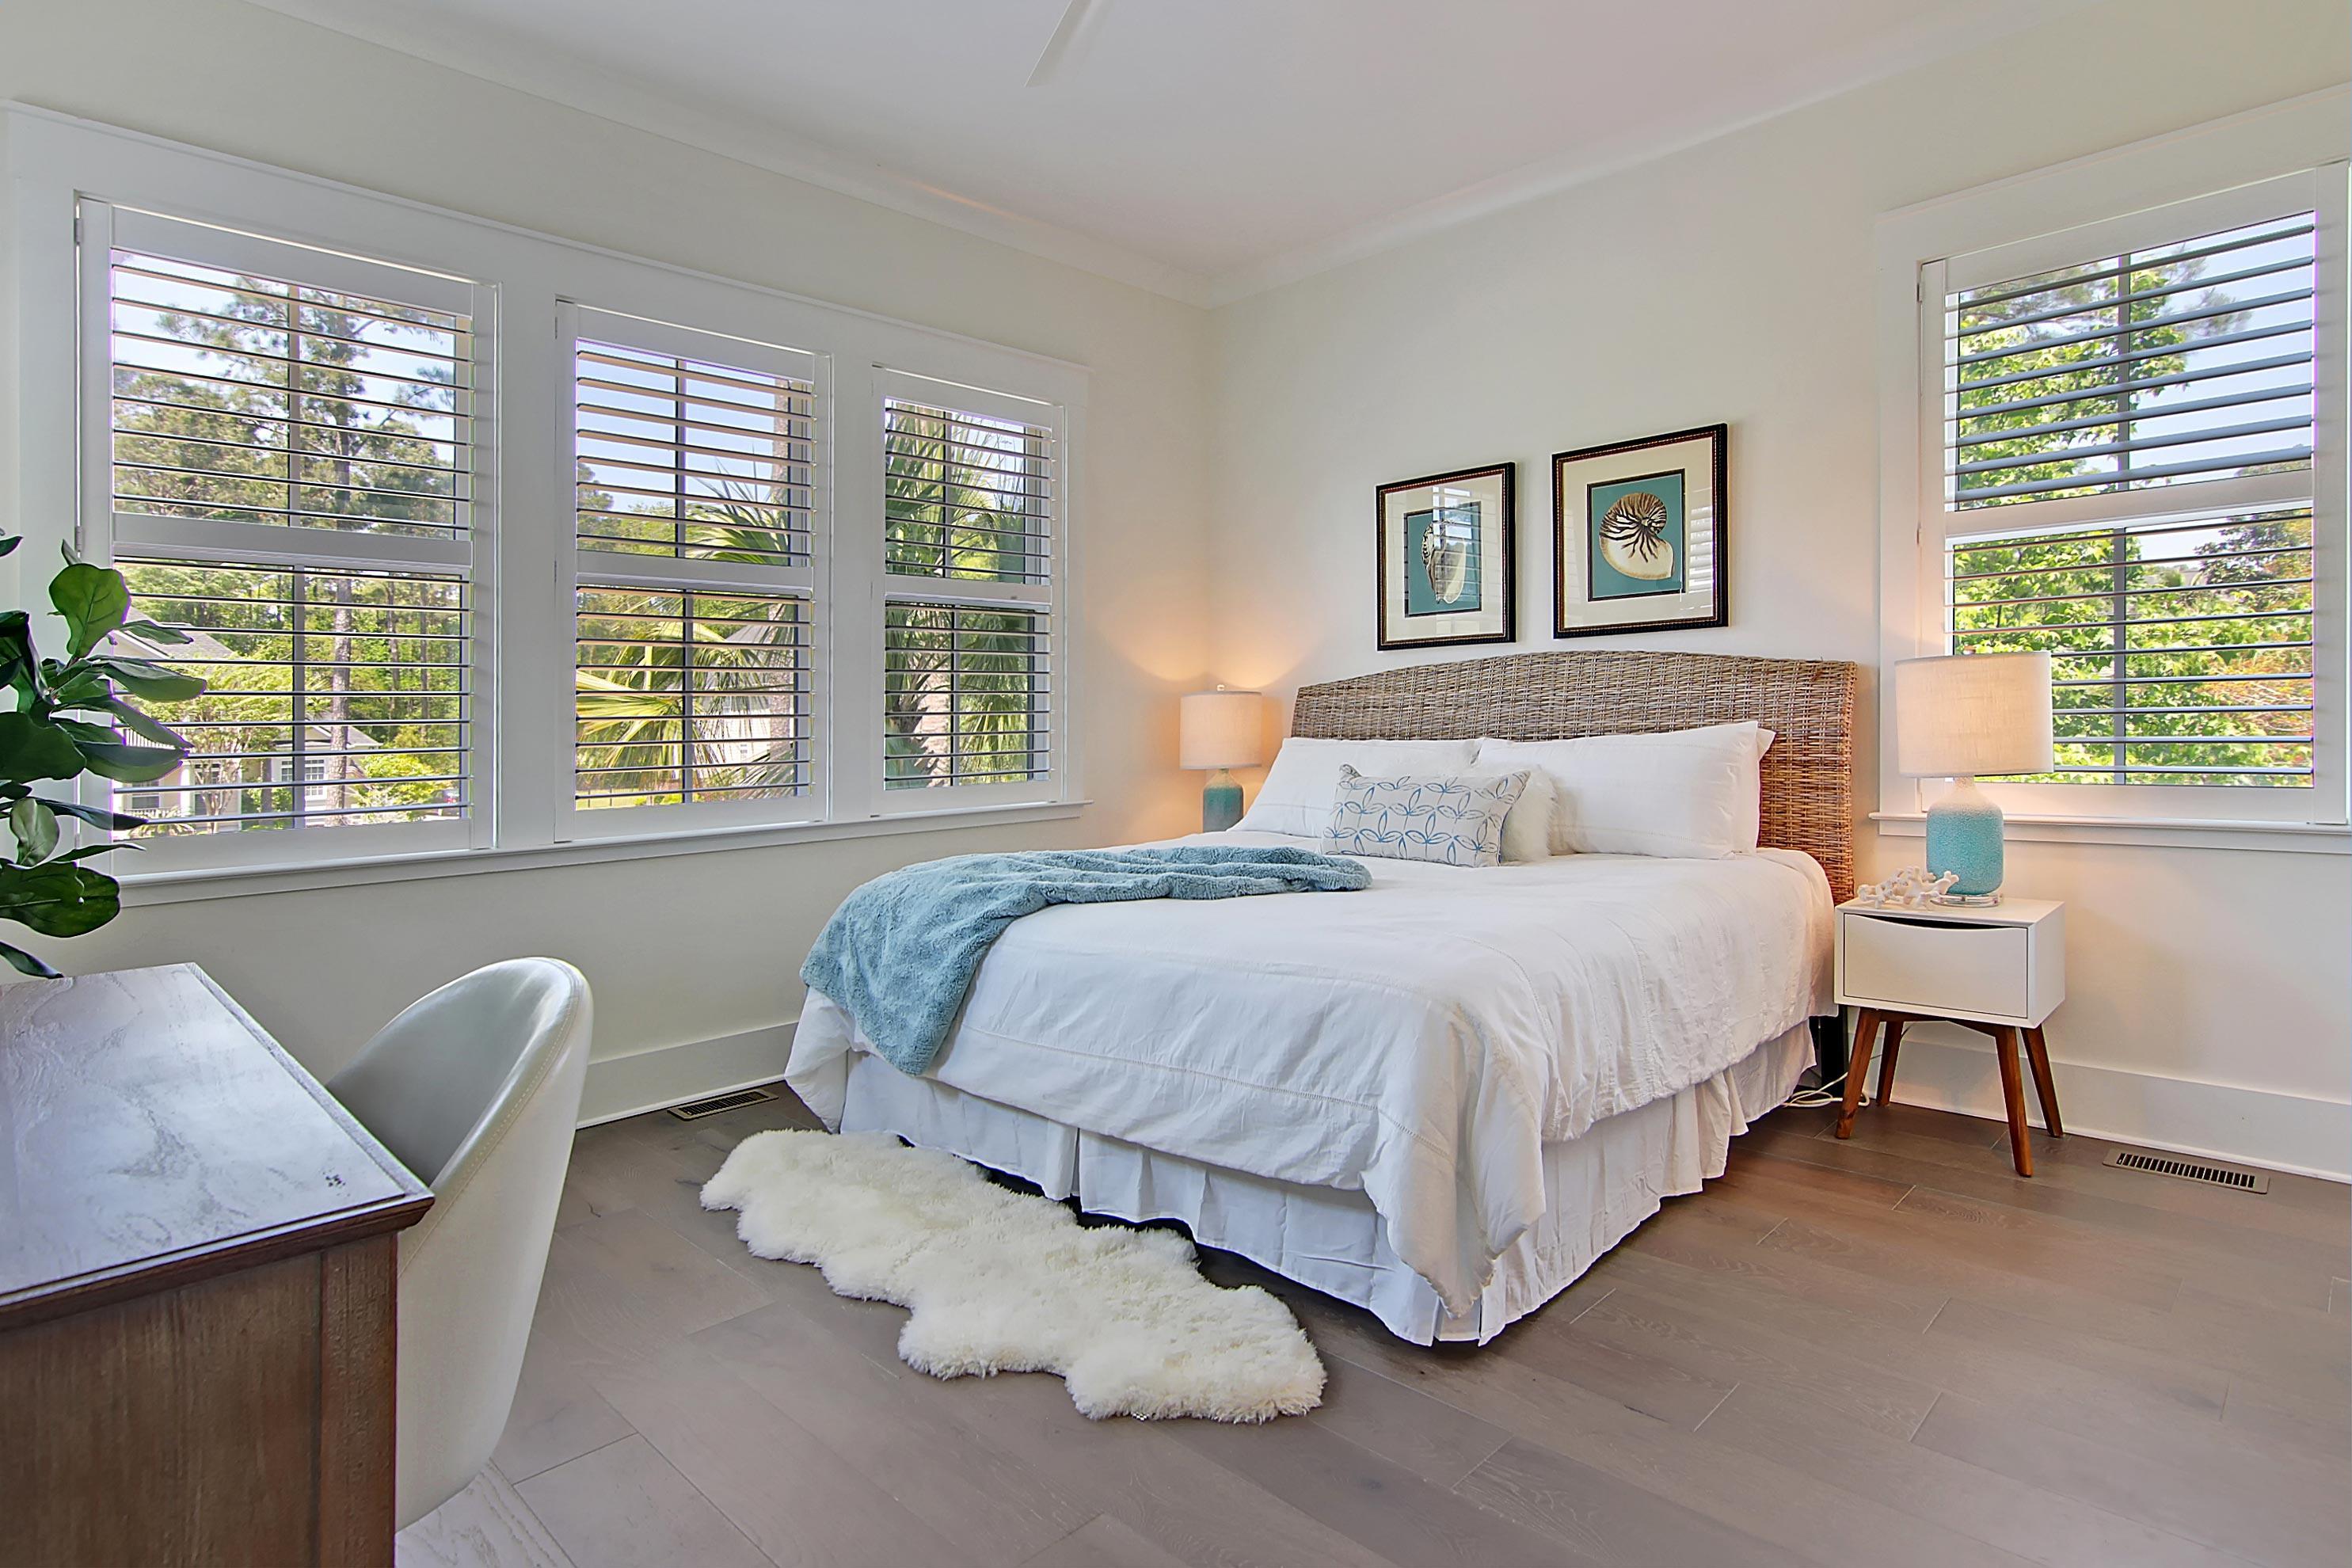 Dunes West Homes For Sale - 2456 Darts Cove, Mount Pleasant, SC - 1